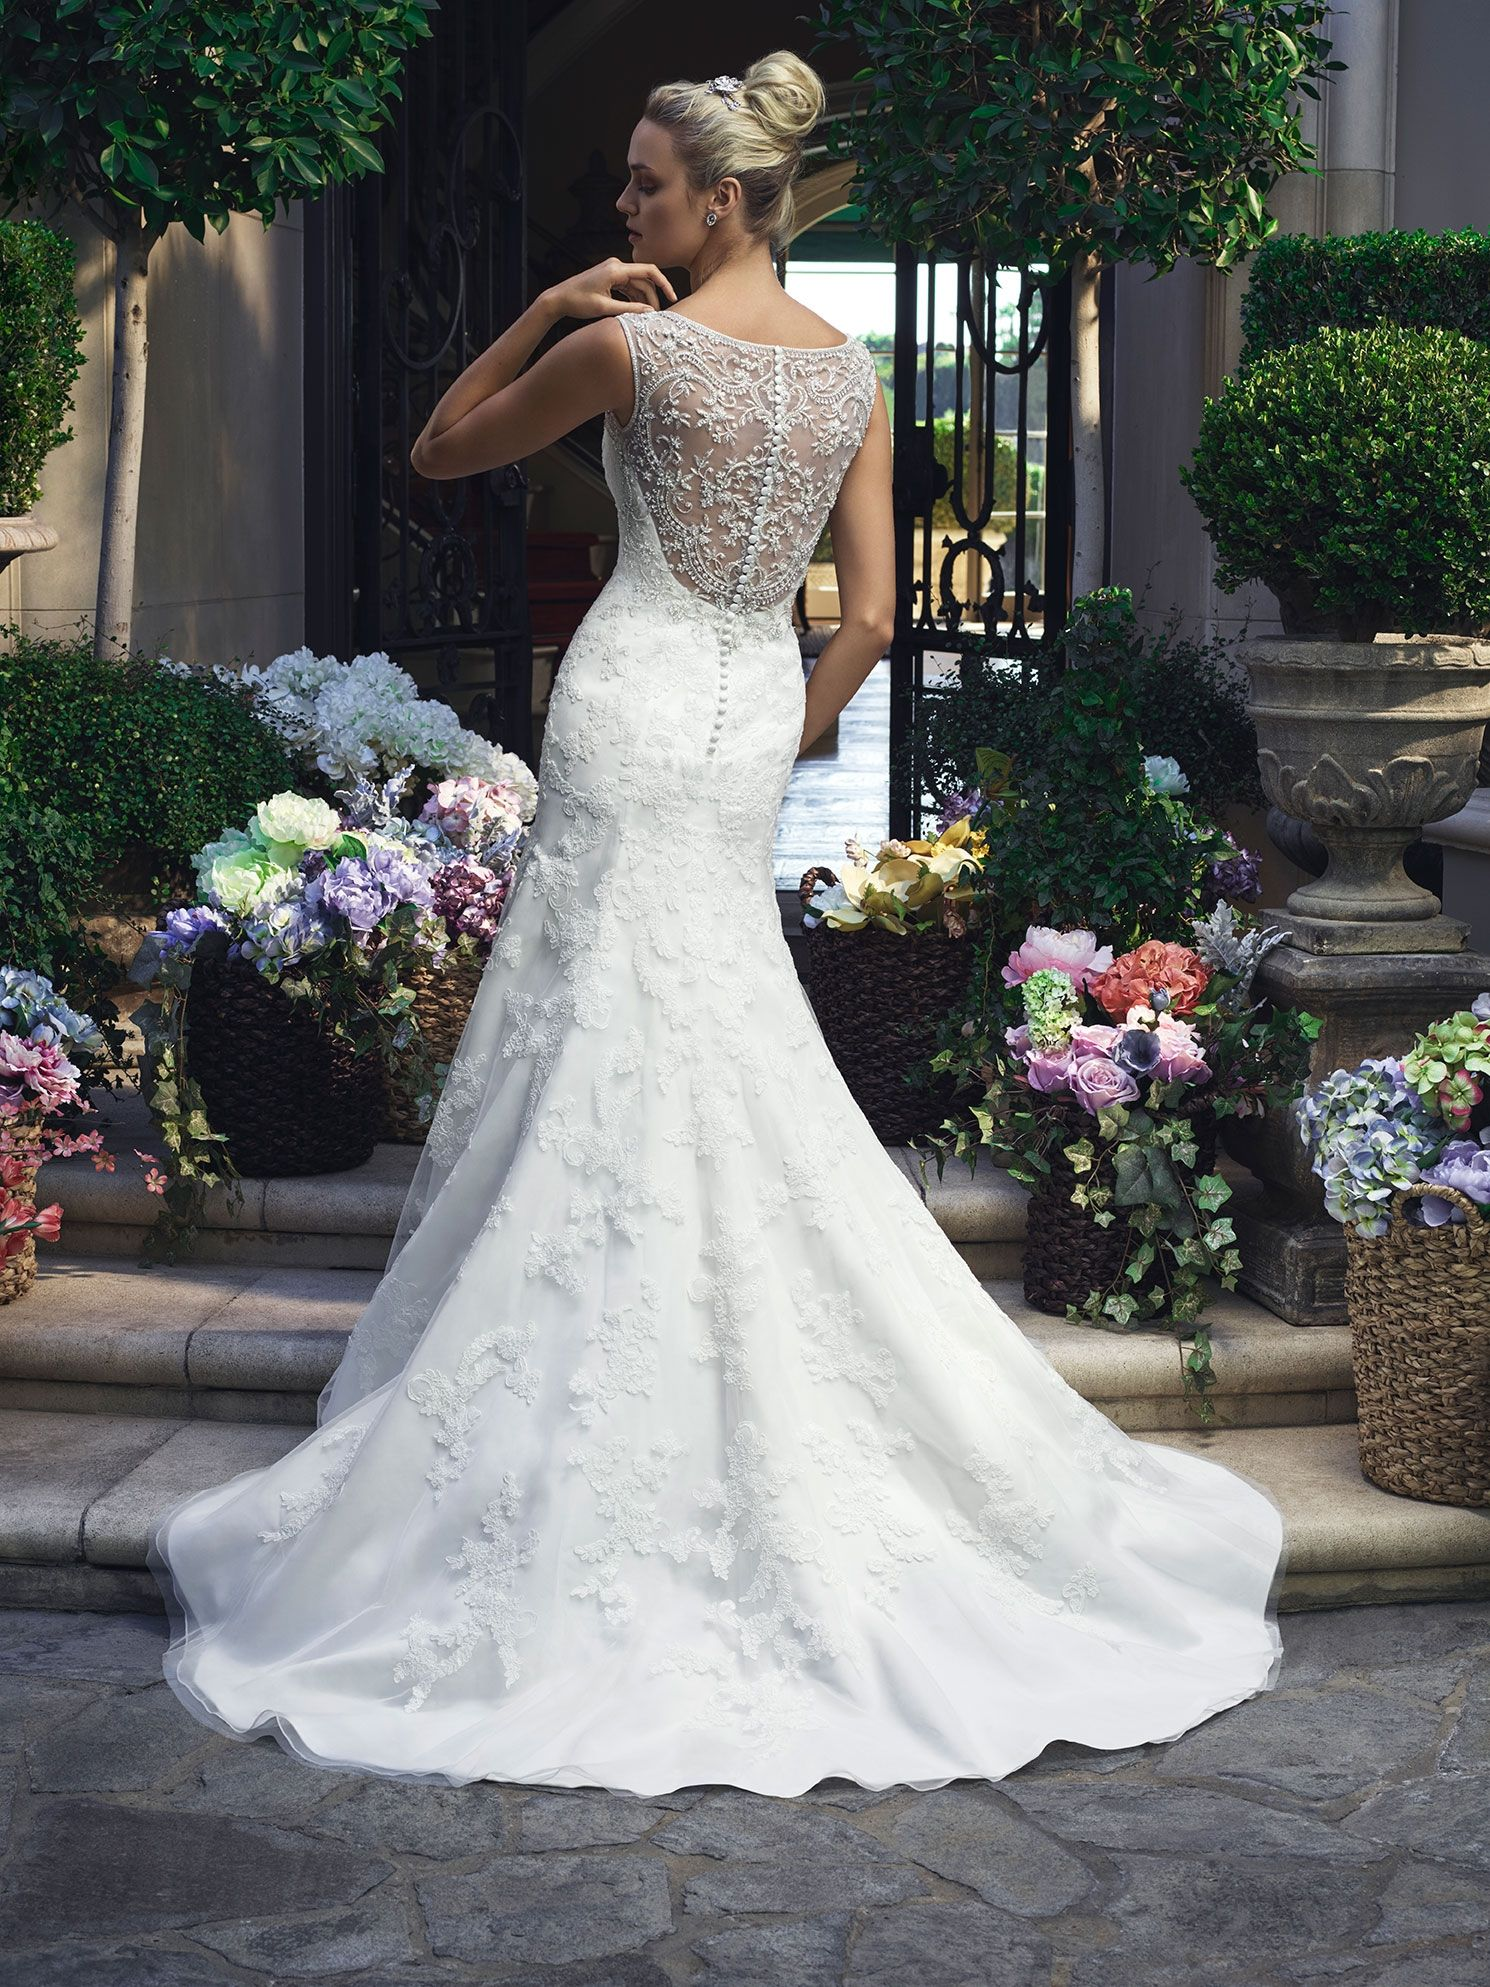 Style wedding gowns pinterest casablanca vintage glamour